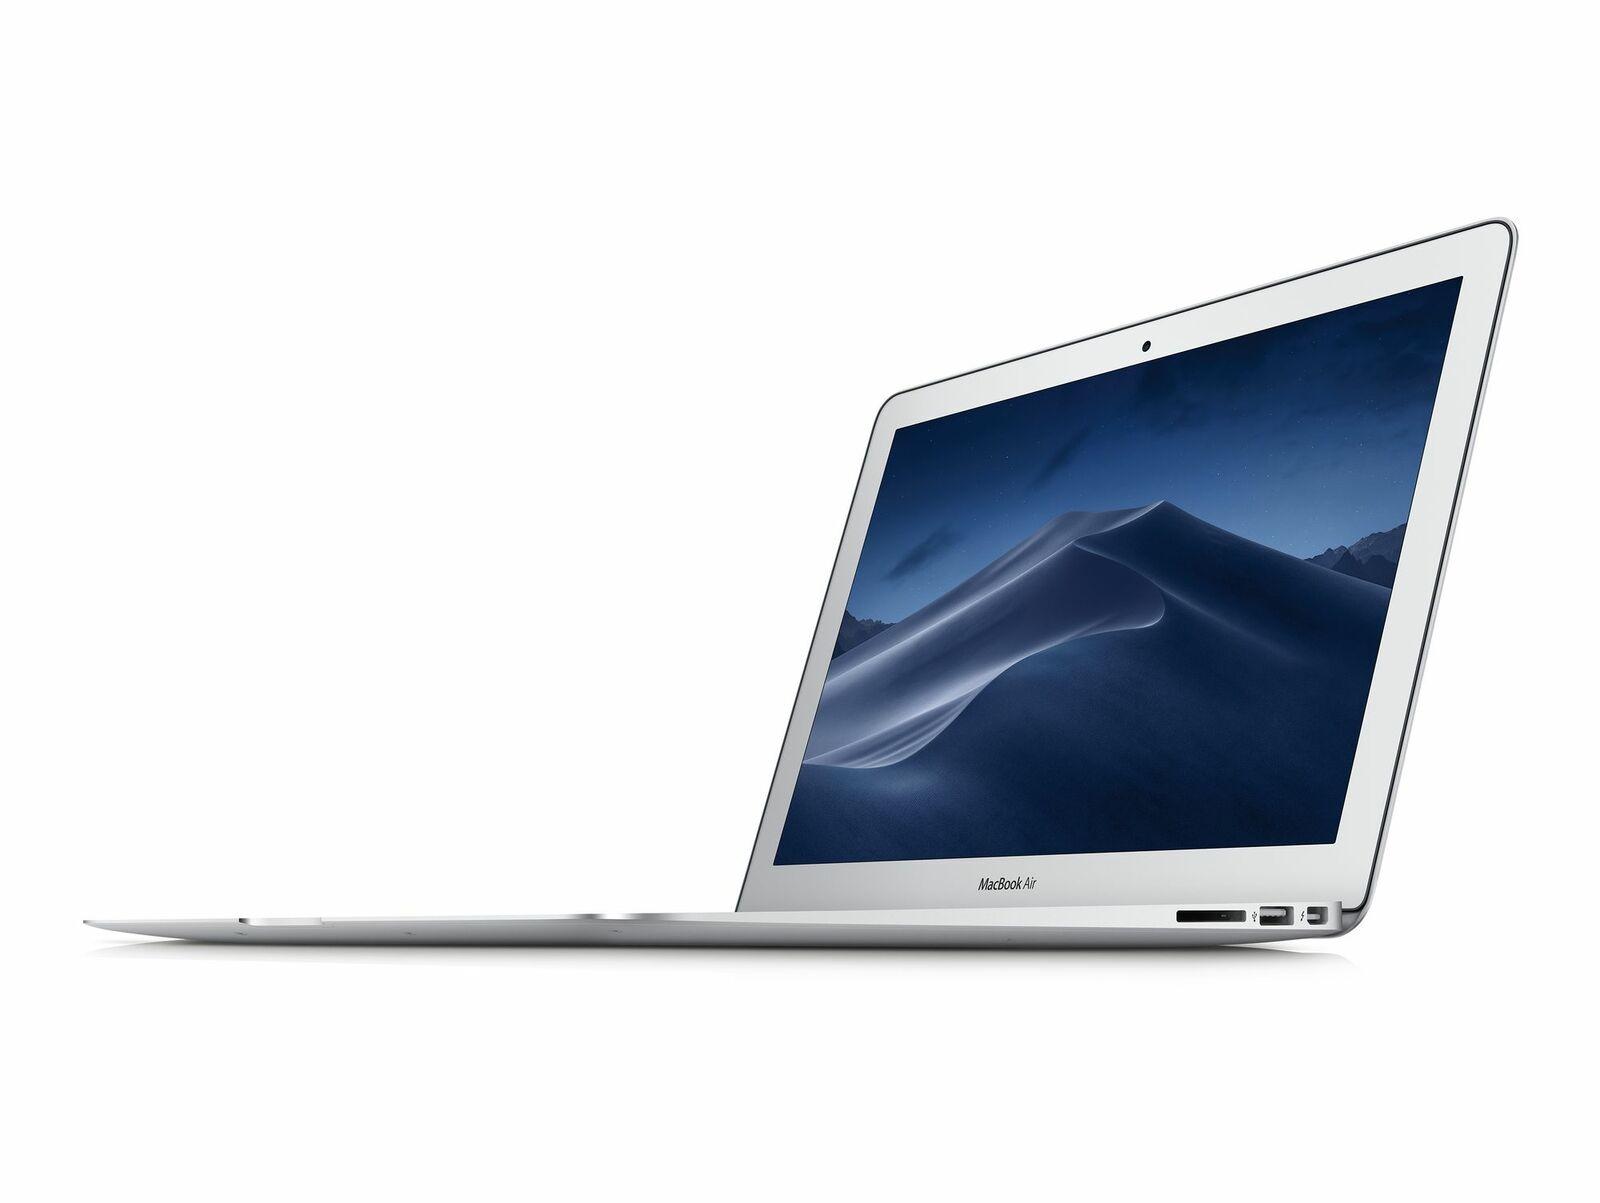 Apple MacBook Air 13″, Intel i5 1,8 GHz, 8 GB RAM, 128 GB SSD